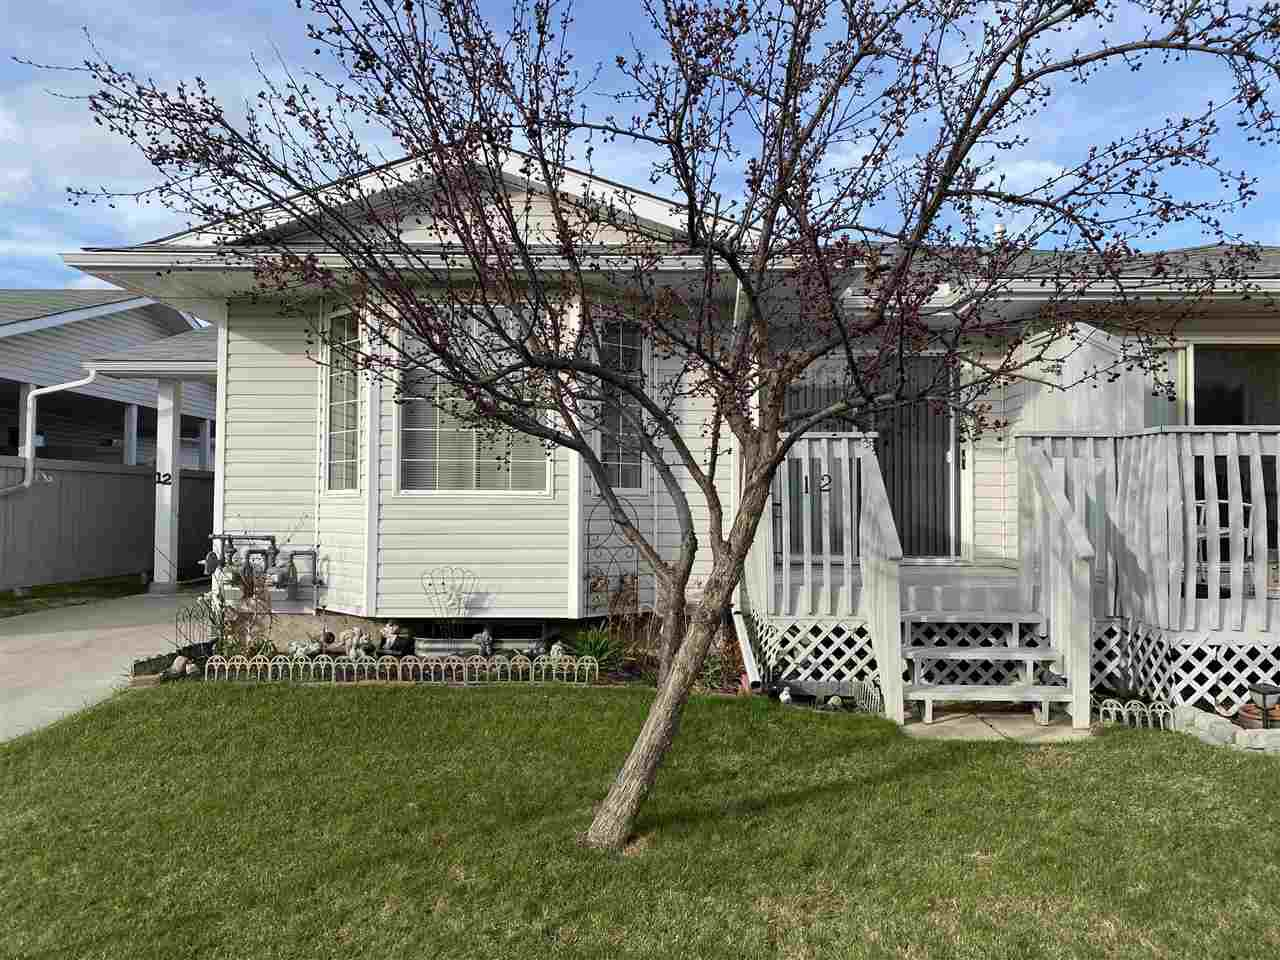 Main Photo: 12 1904 MILL_WOODS Road in Edmonton: Zone 29 House Half Duplex for sale : MLS®# E4205870